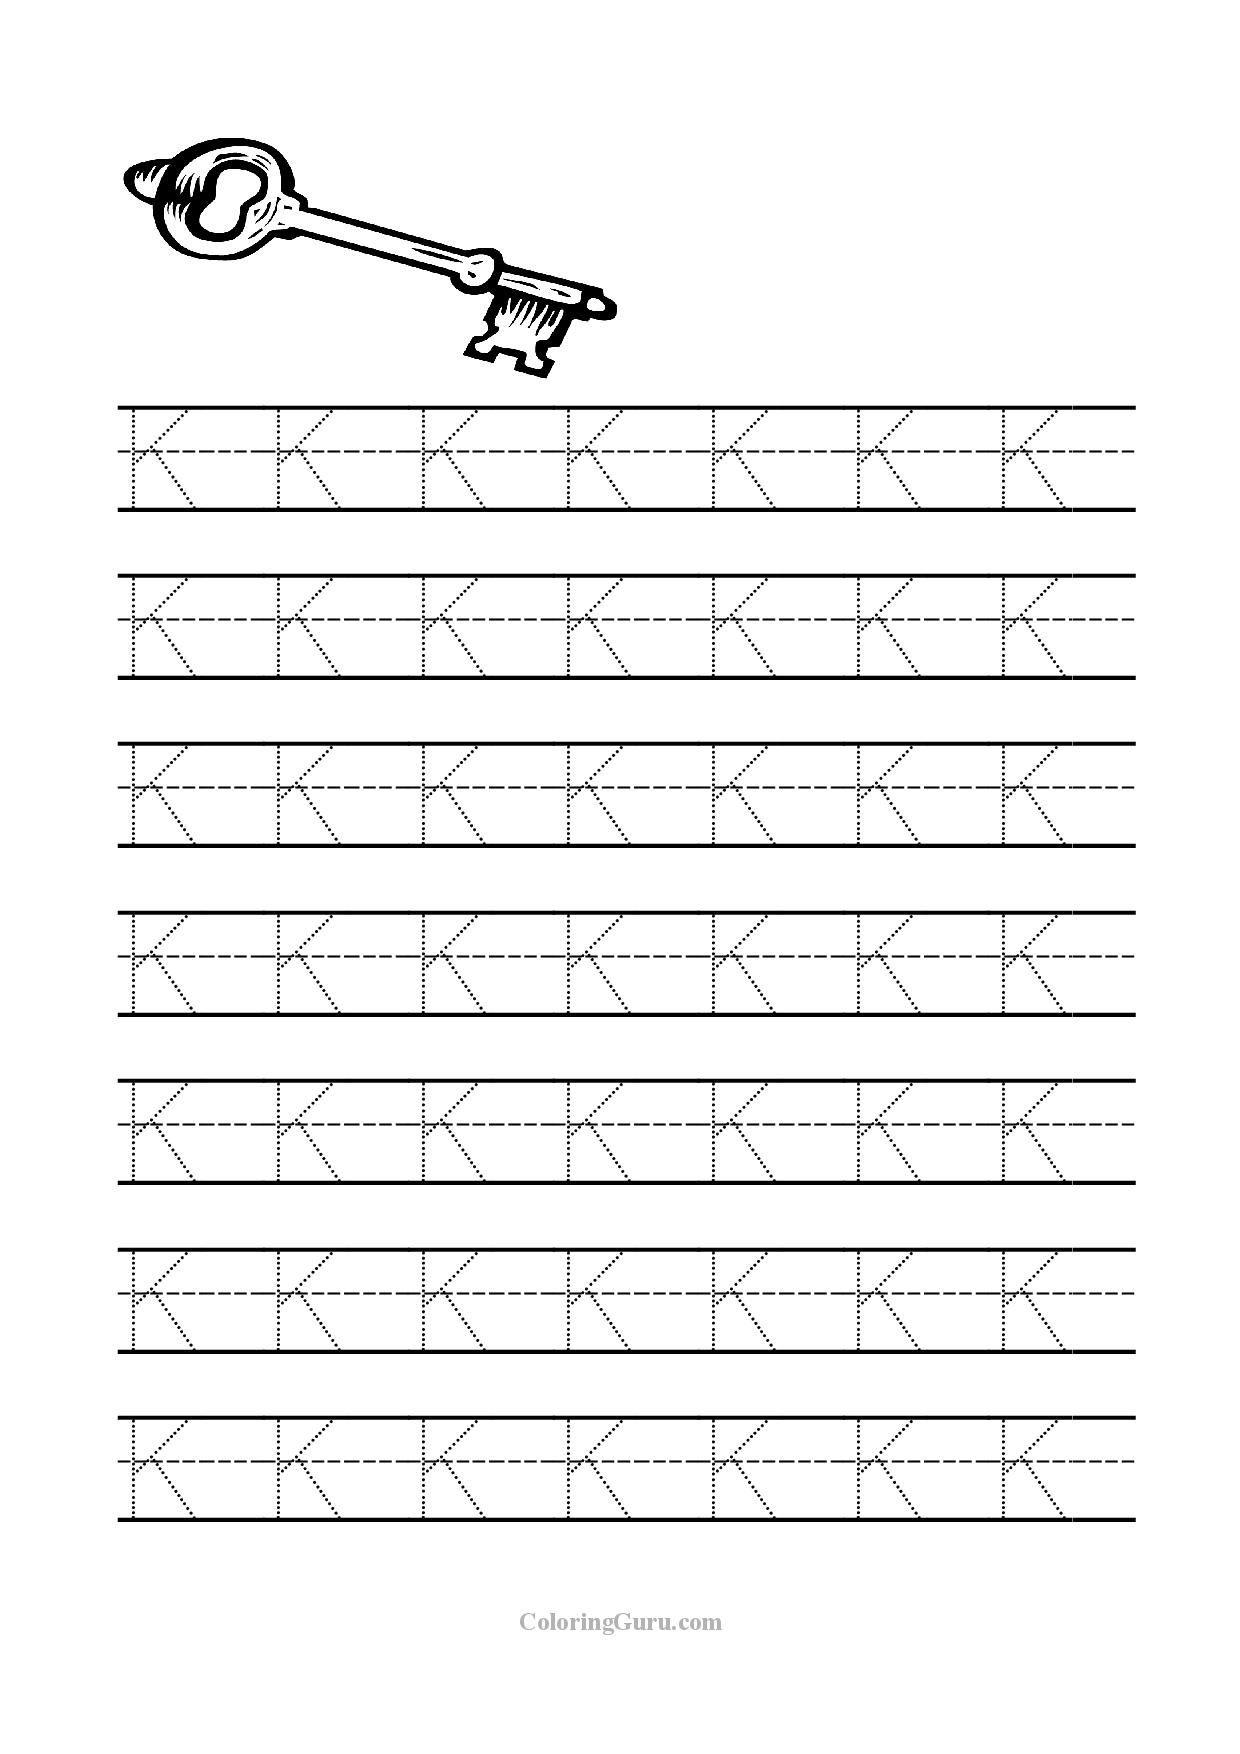 Free Printable Tracing Letter K Worksheets For Preschool | Kids - Free Printable Letter K Worksheets